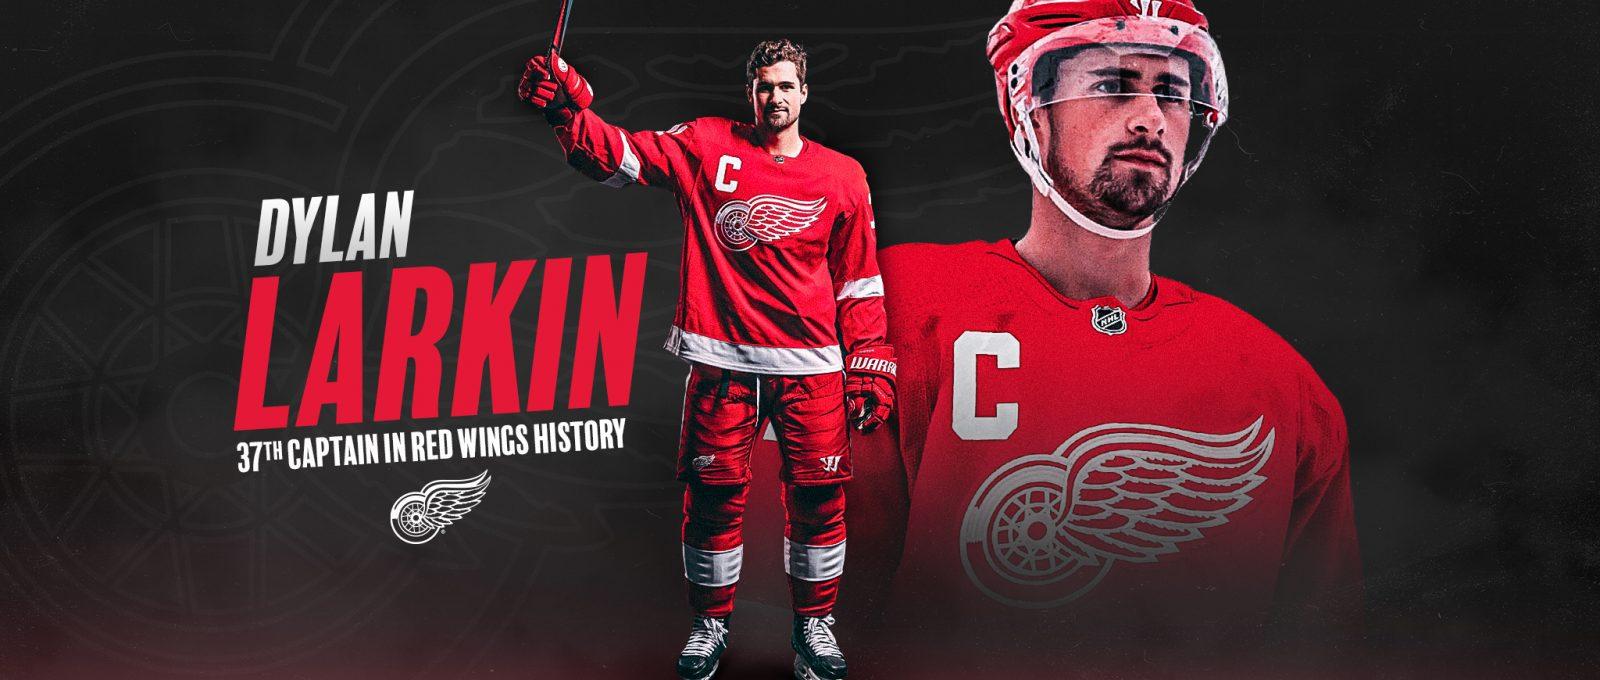 Hockey player wearing red uniform